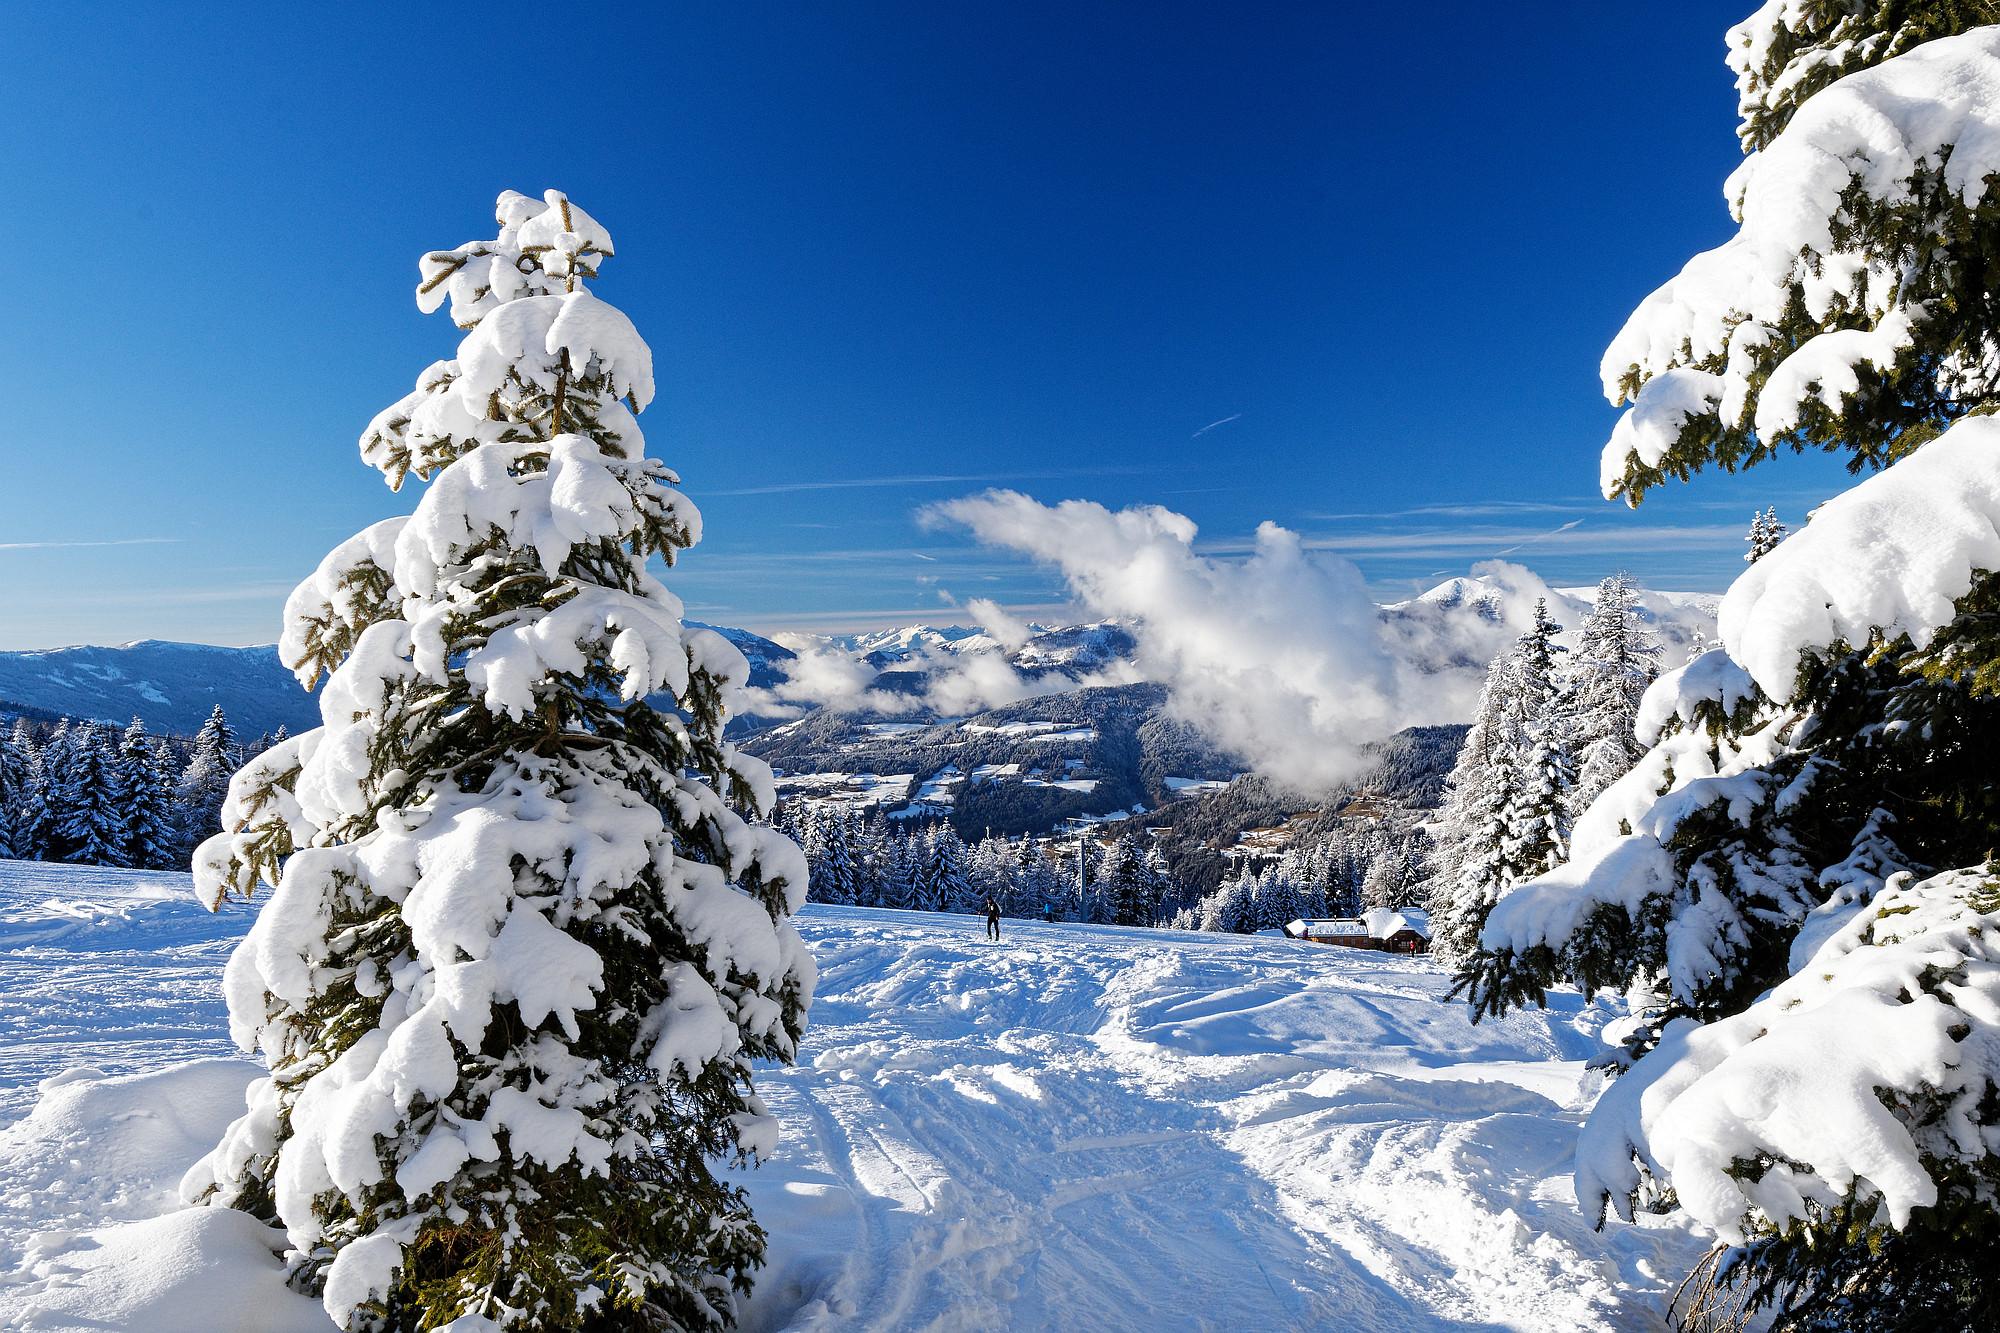 winterwonderland 2020-12-30